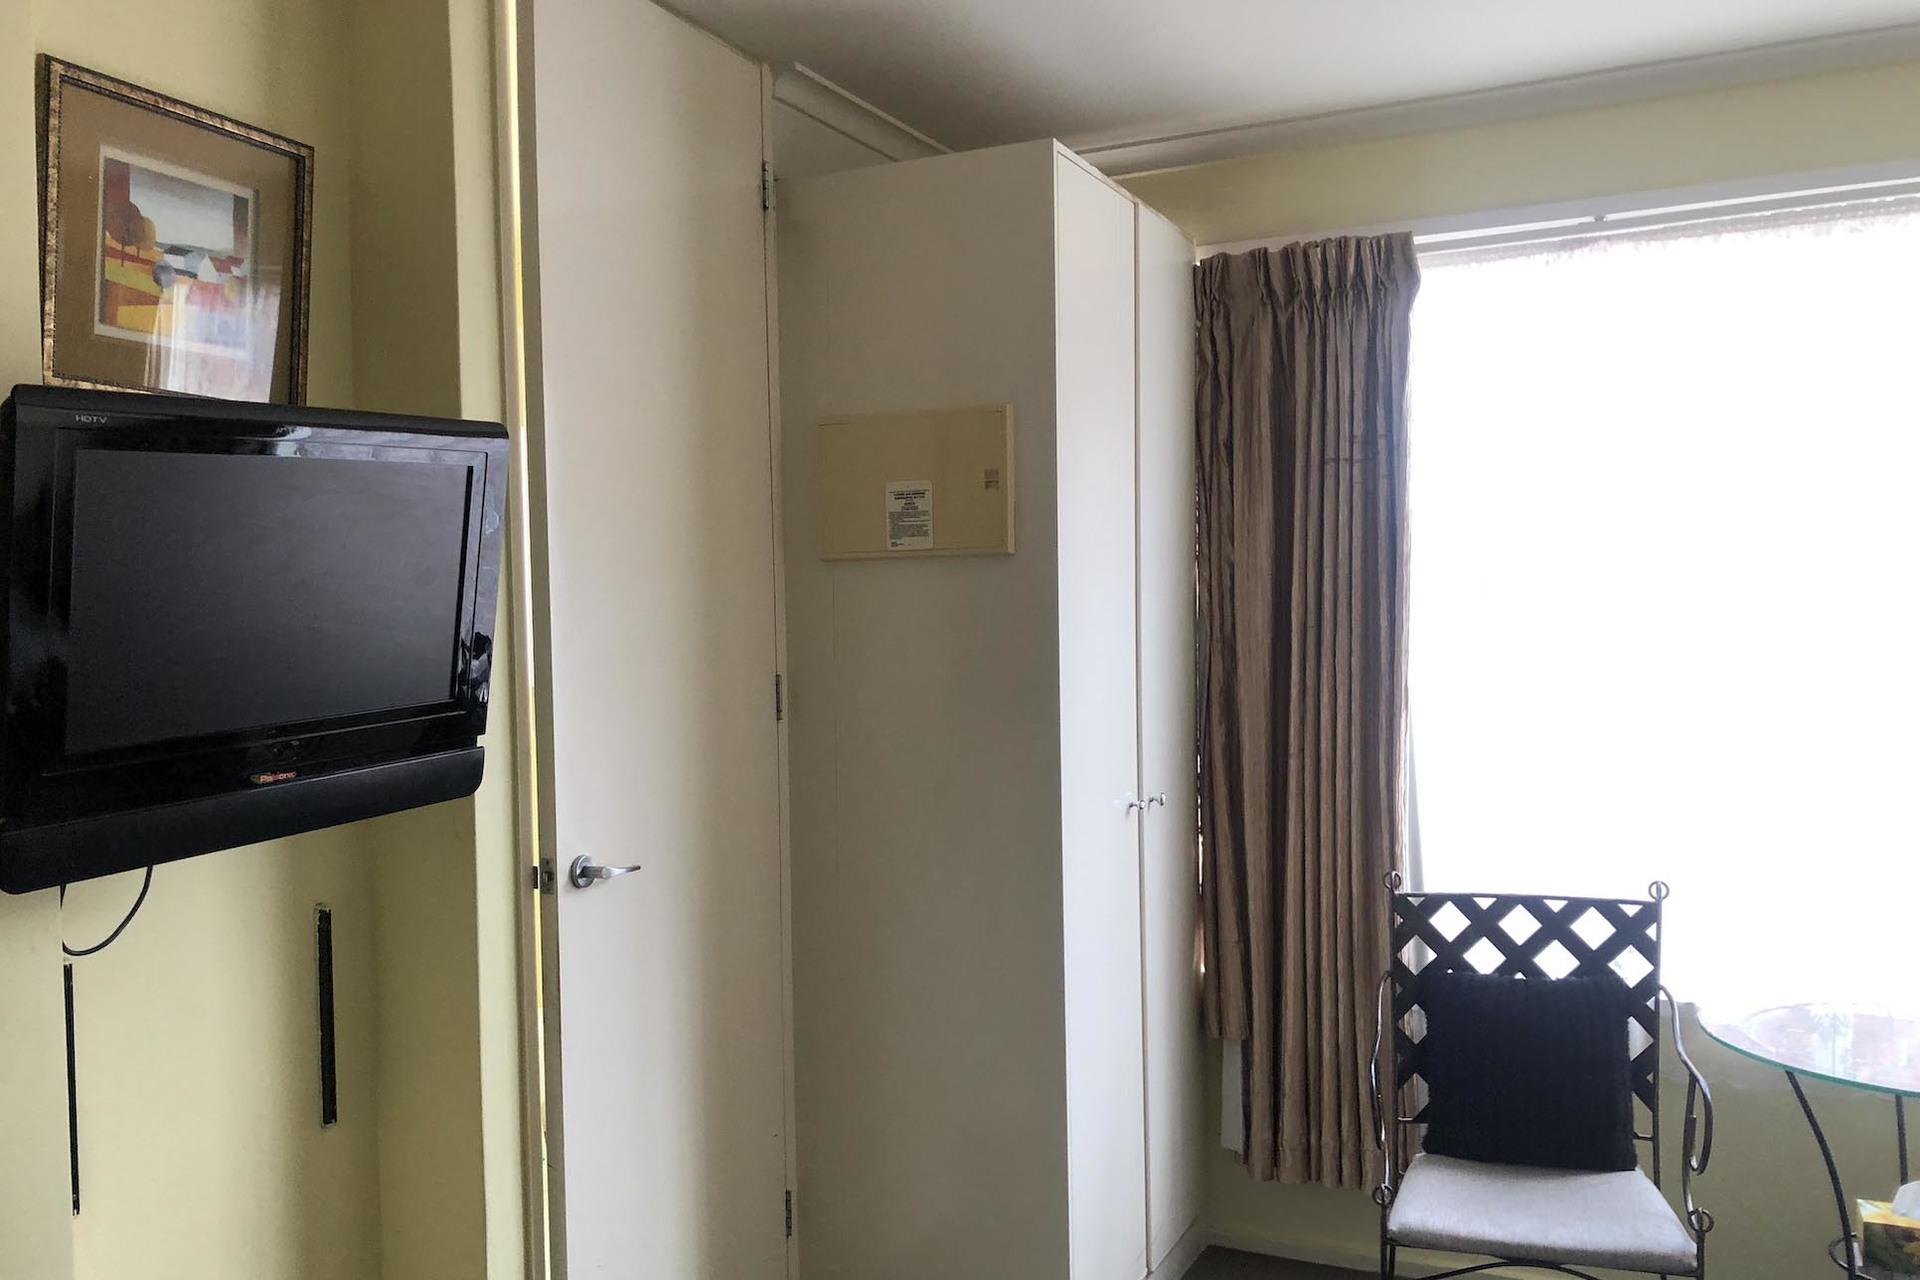 c - Knightsbridge Apartments